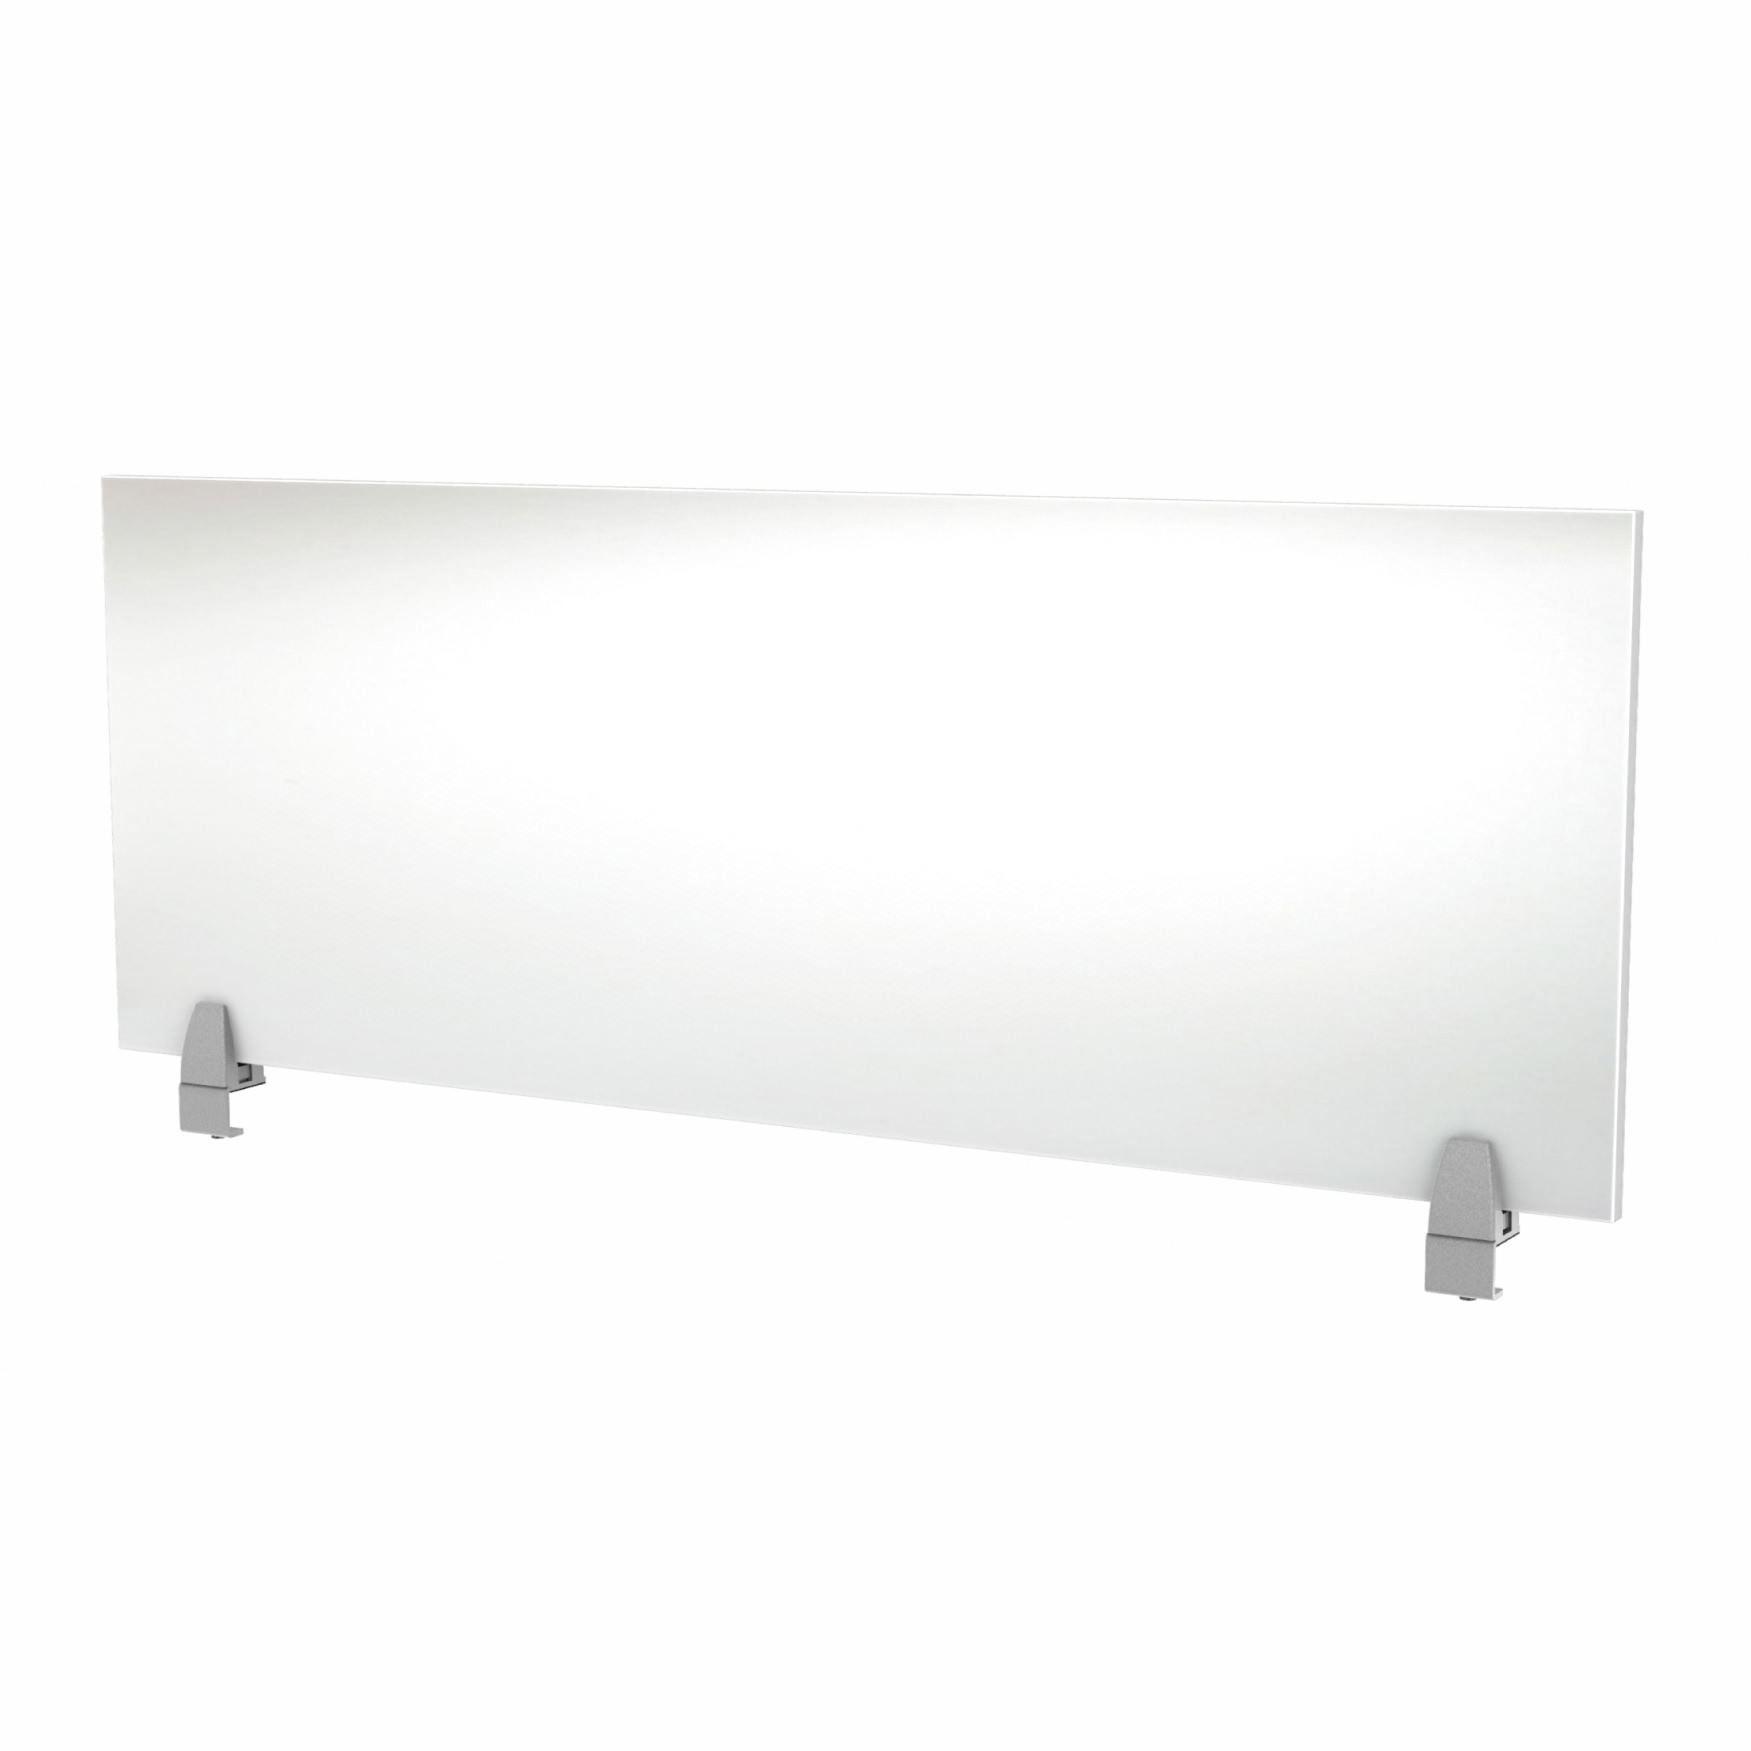 Enclave Panel Whiteboard desk Divider from Merge Works Merge